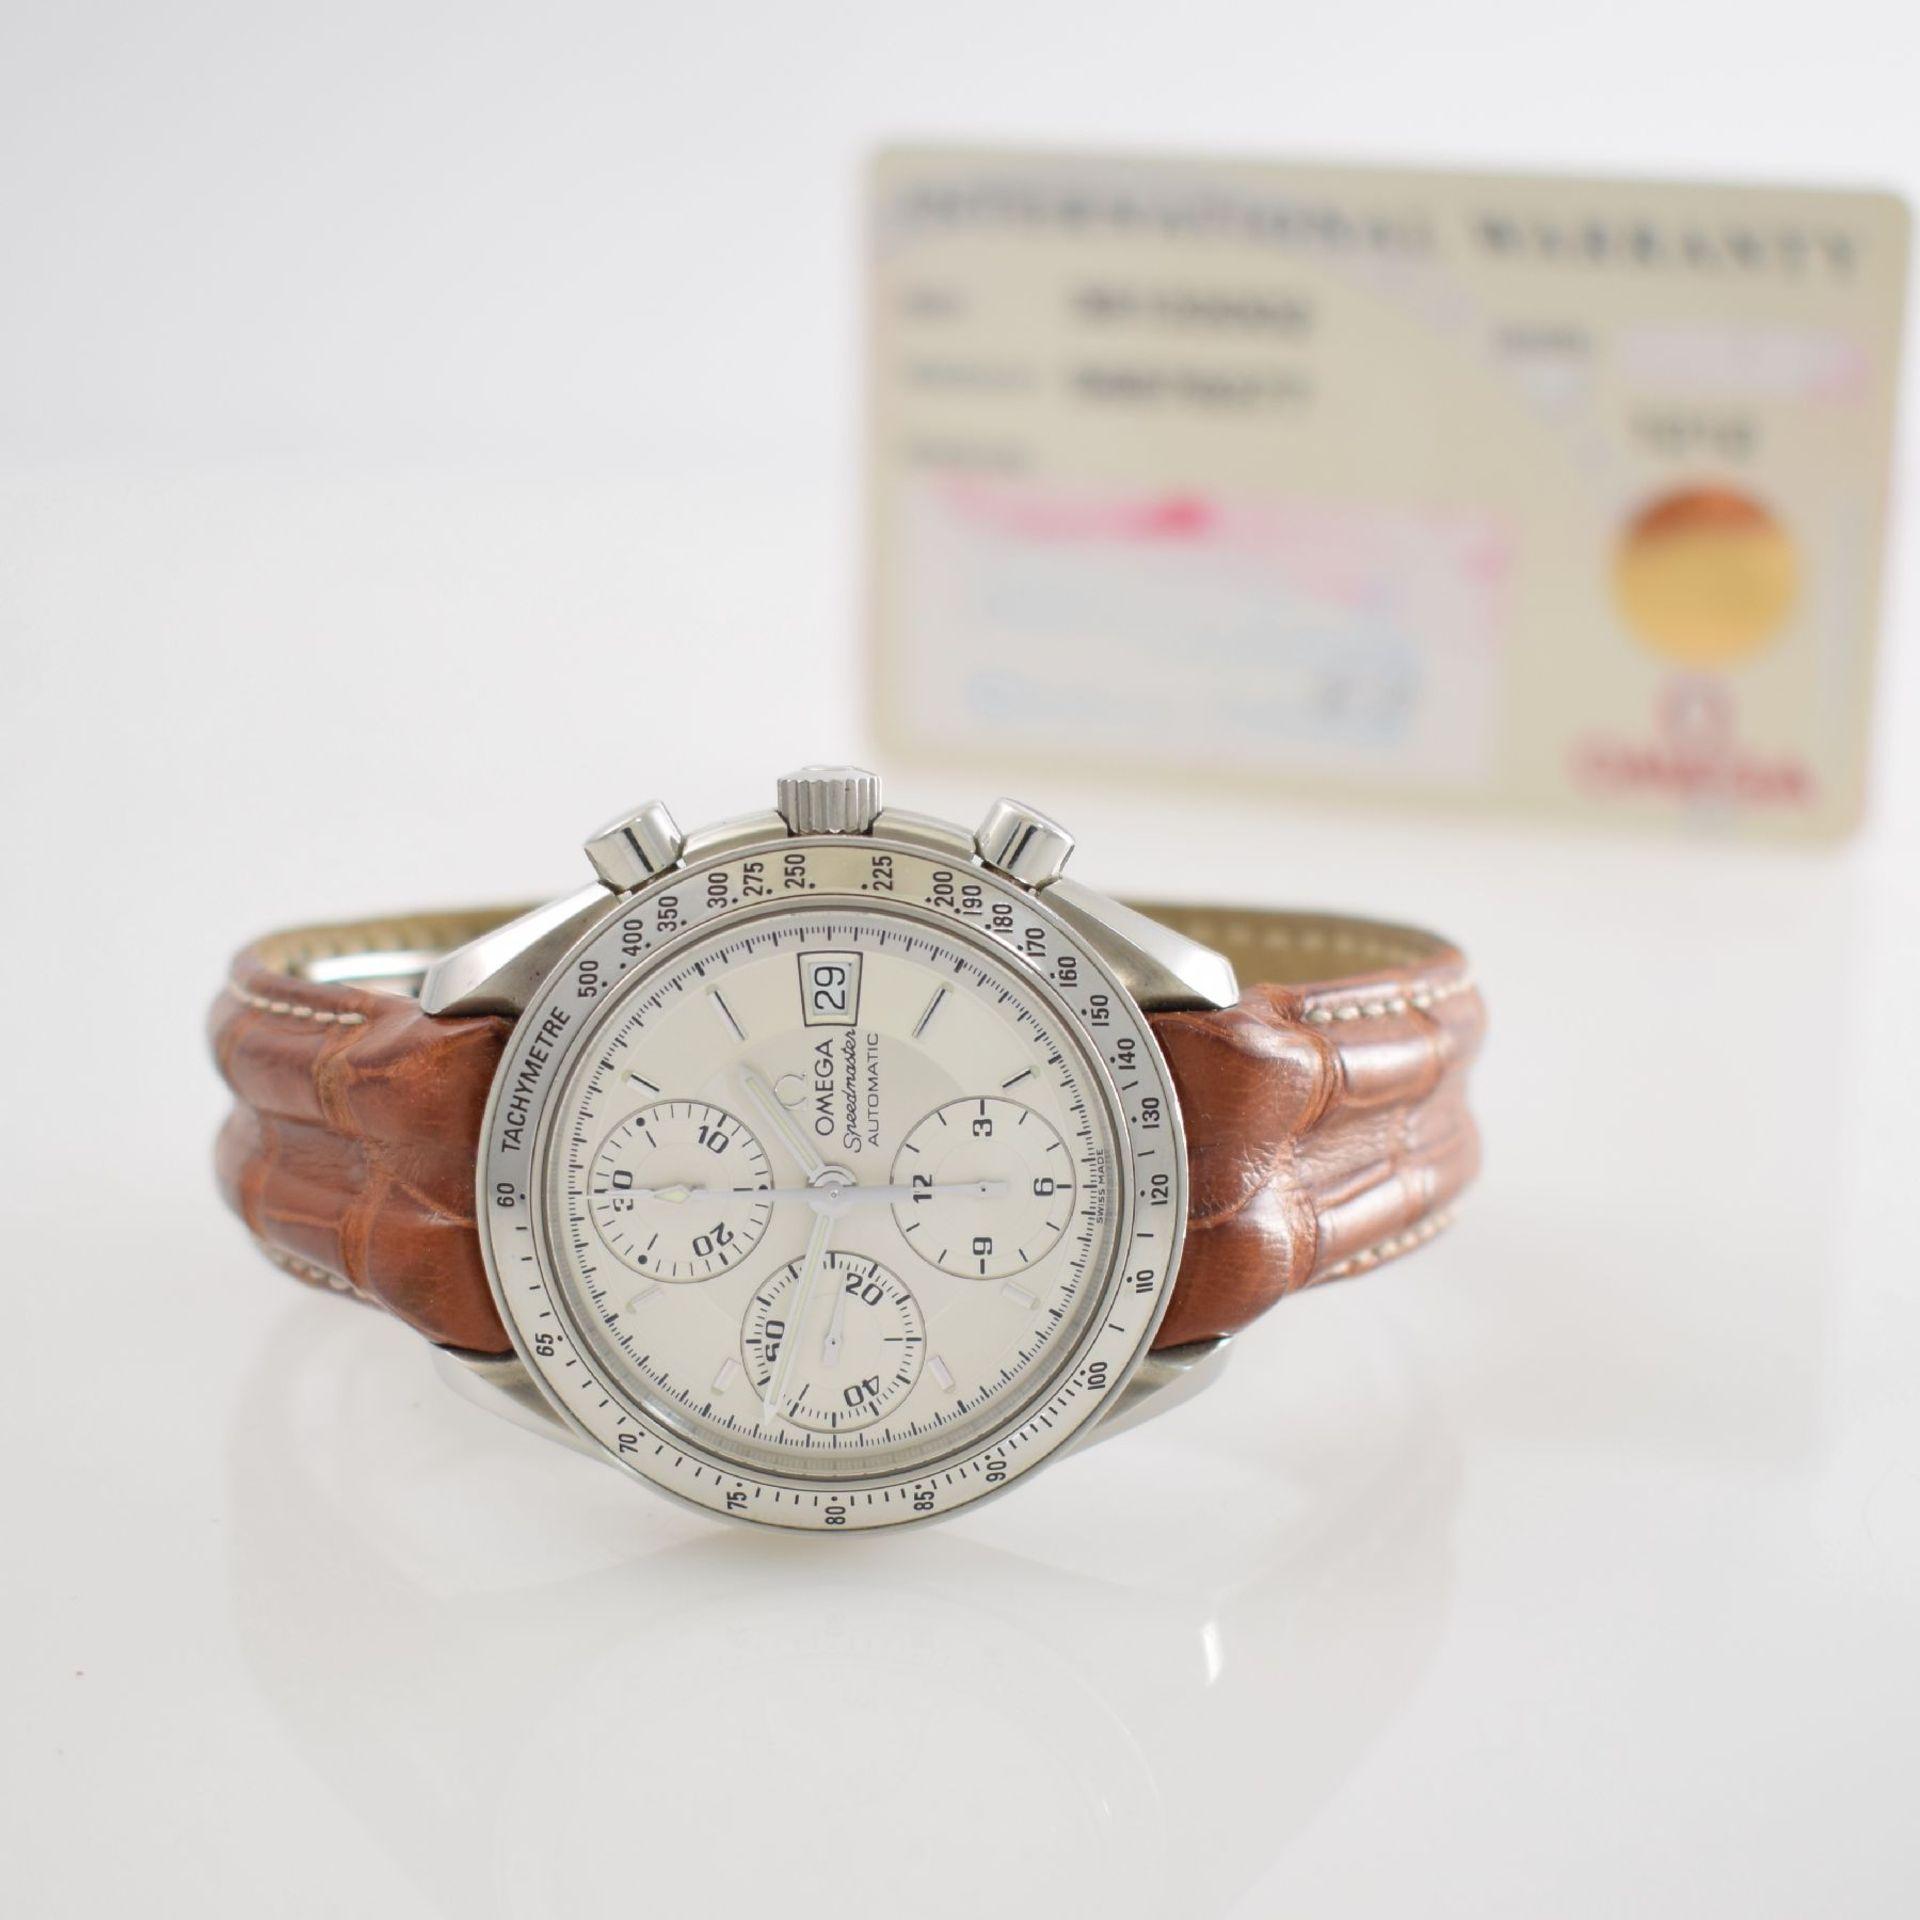 OMEGA Armbandchronograph Serie Speedmaster, Automatik, Schweiz um 1998, Ref. 1750083/3750083,